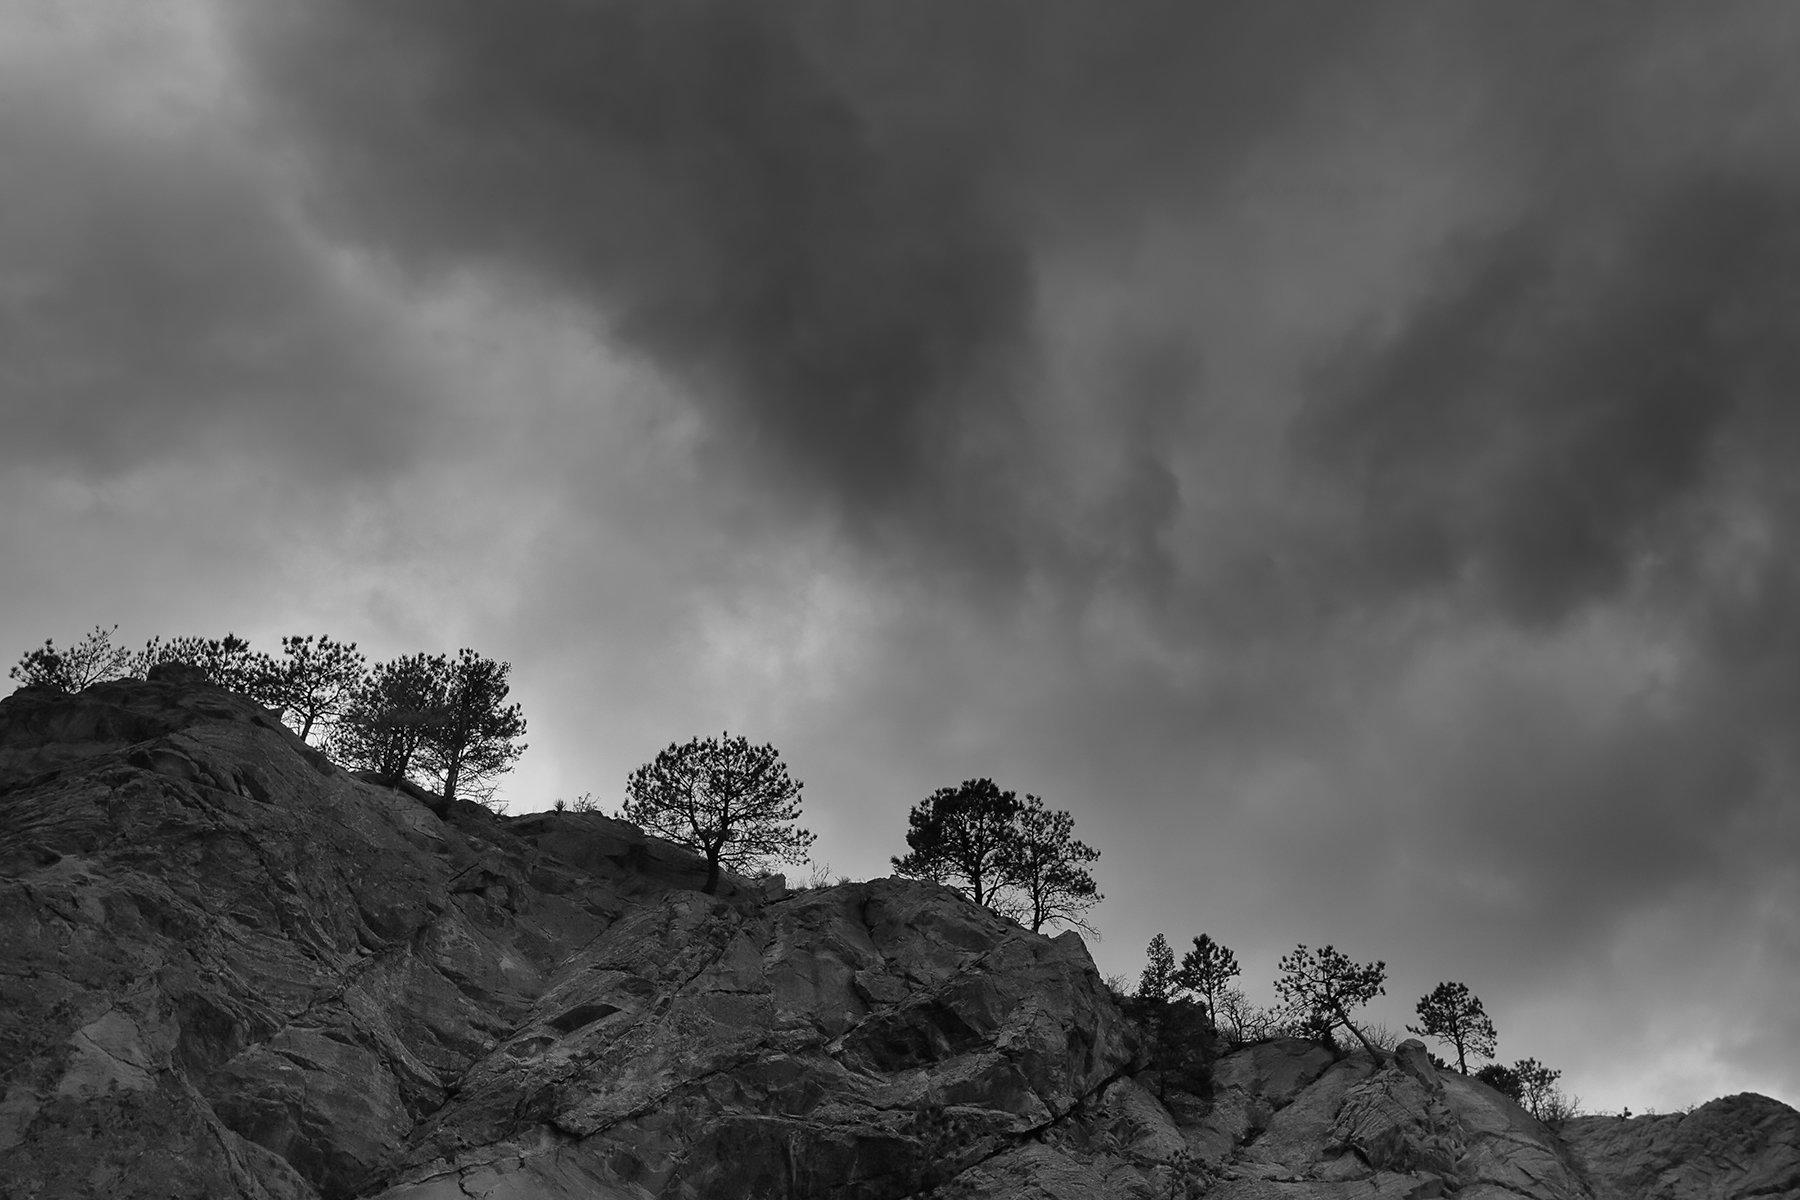 colorado-springs-landscape-black-and-white036.jpg